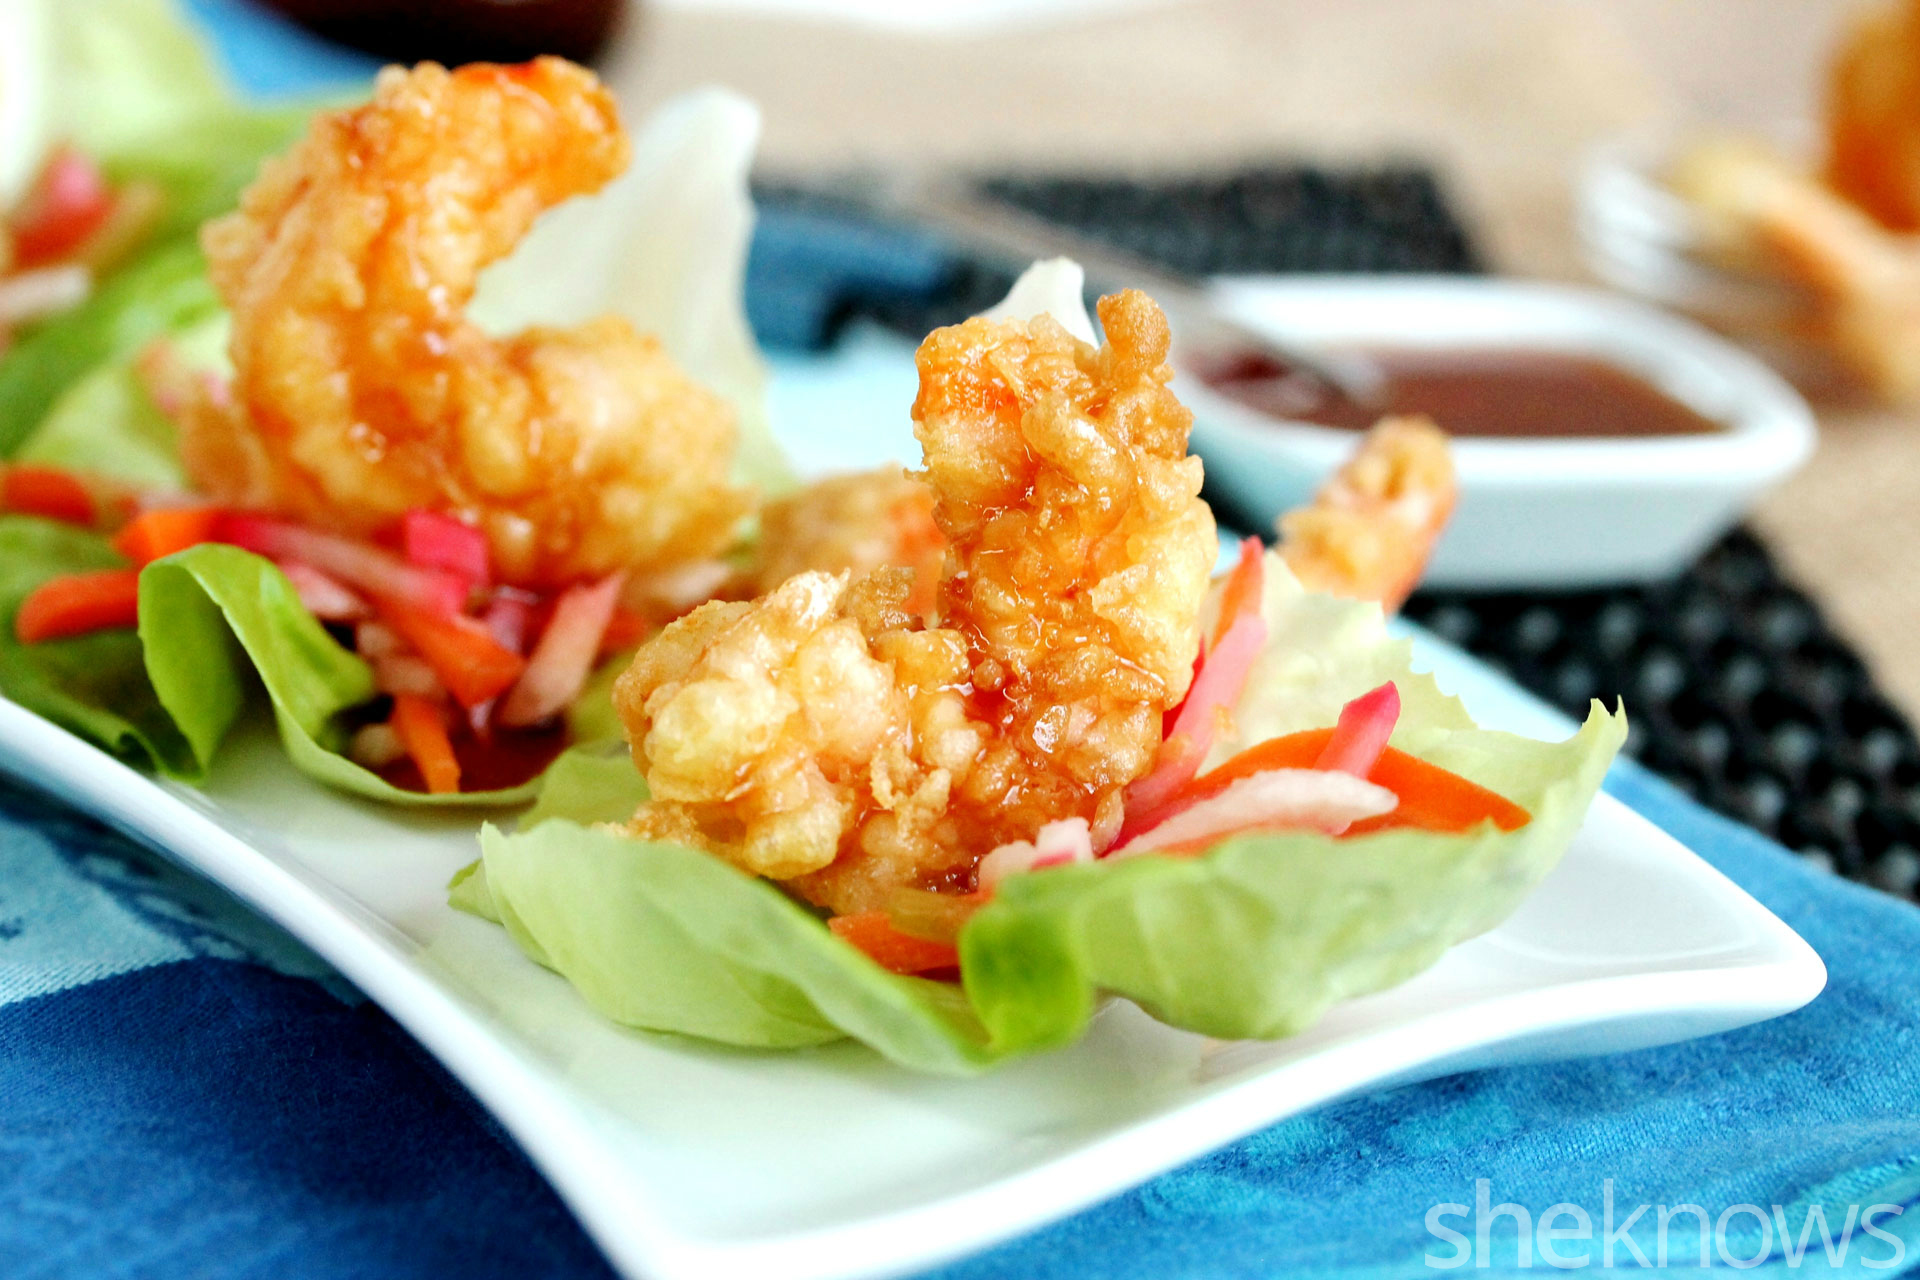 Tempura Shrimp Lettuce Wraps Are Melt In Your Mouth Delicious Sheknows